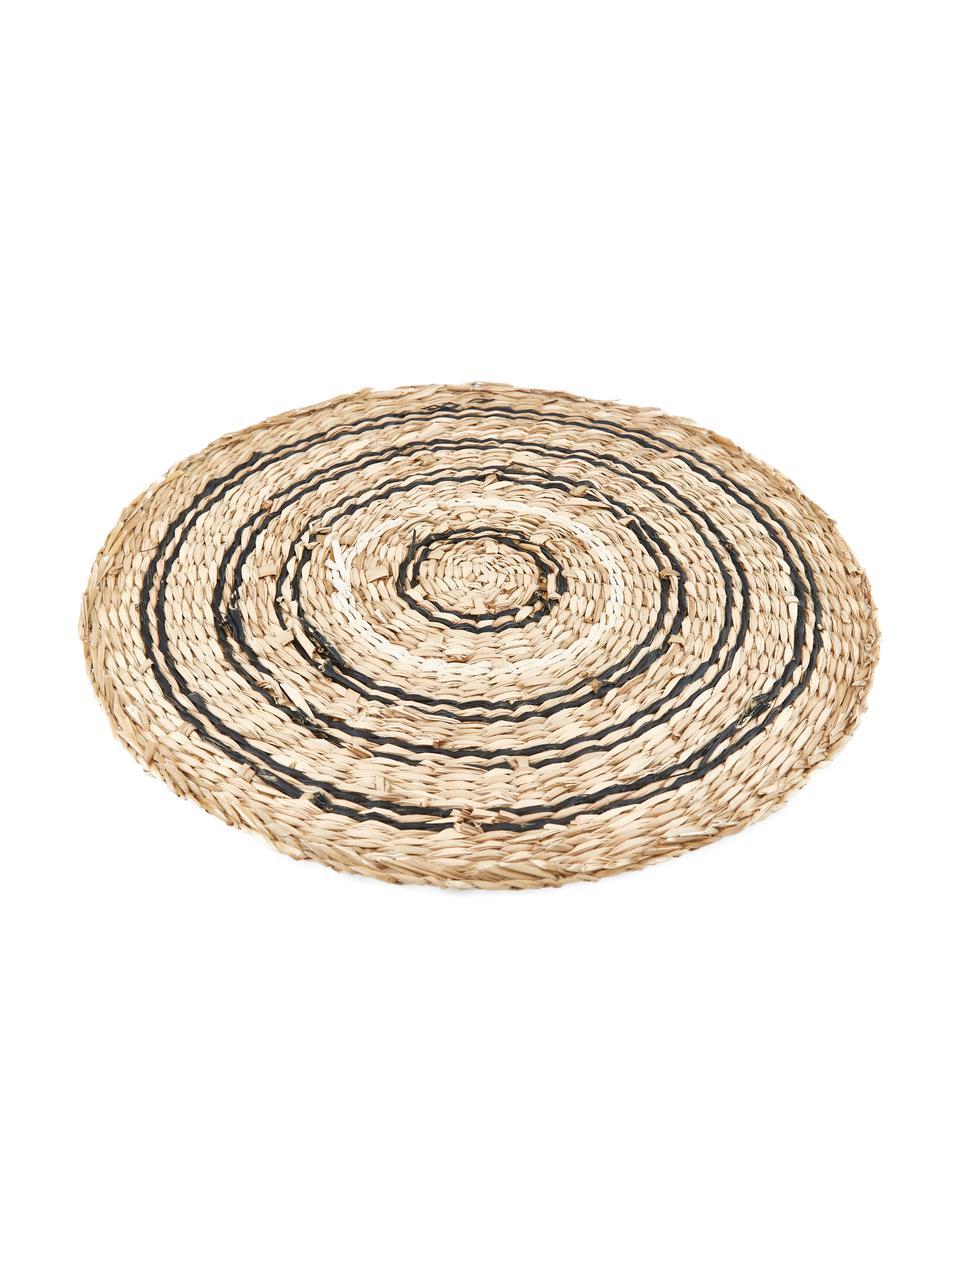 Tovaglietta americana rotonda Kama, Alghe, Beige, bianco, nero, Ø 38 cm